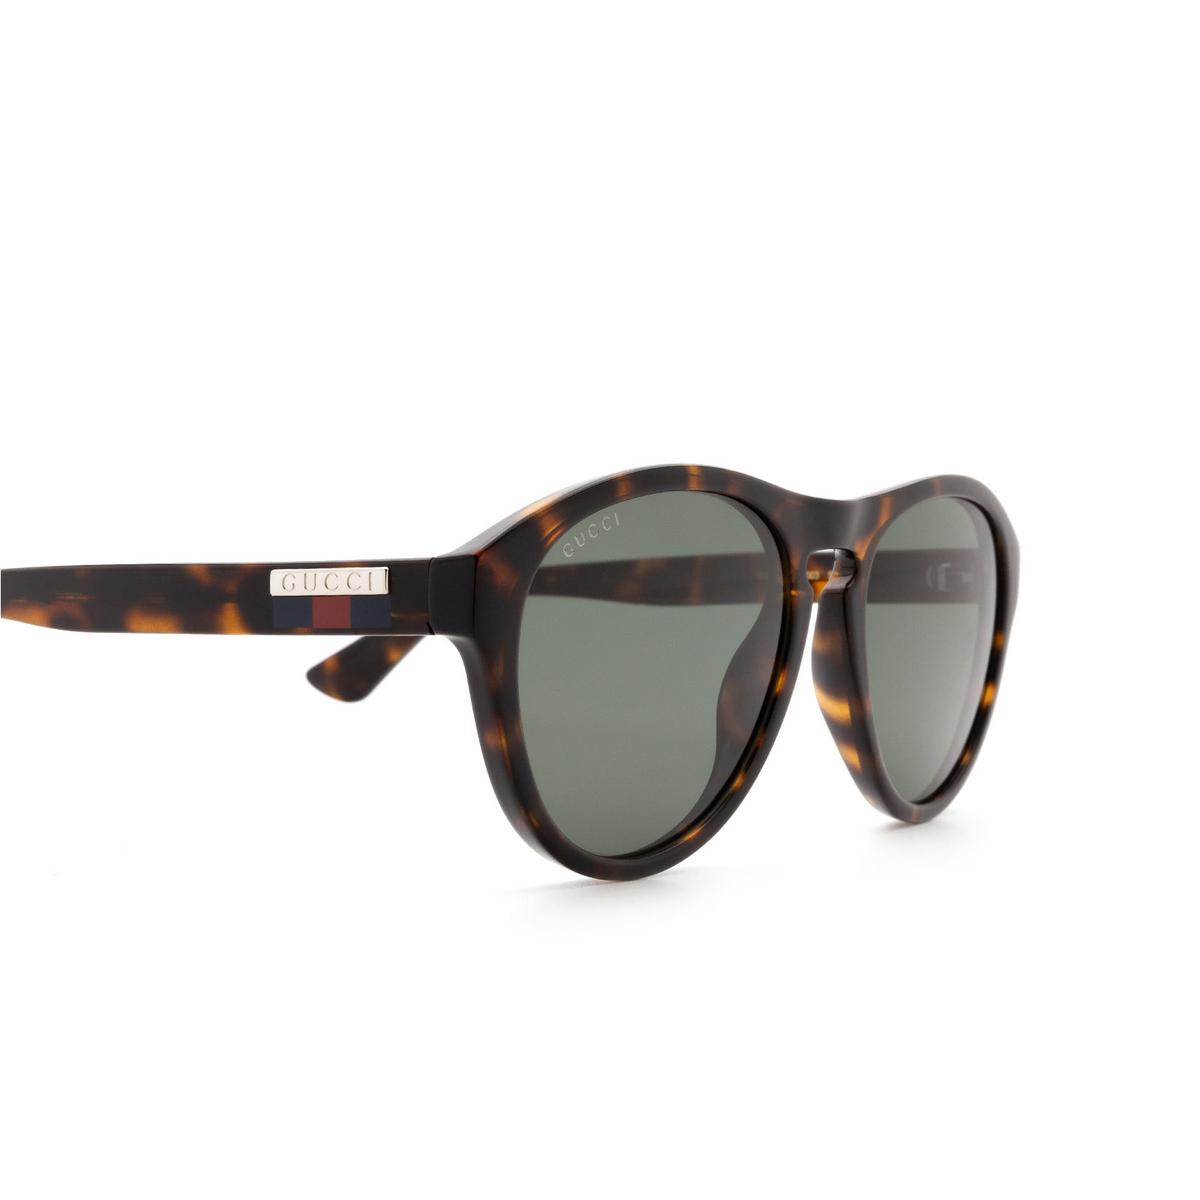 Gucci® Aviator Sunglasses: GG0747S color Havana 003 - 3/3.